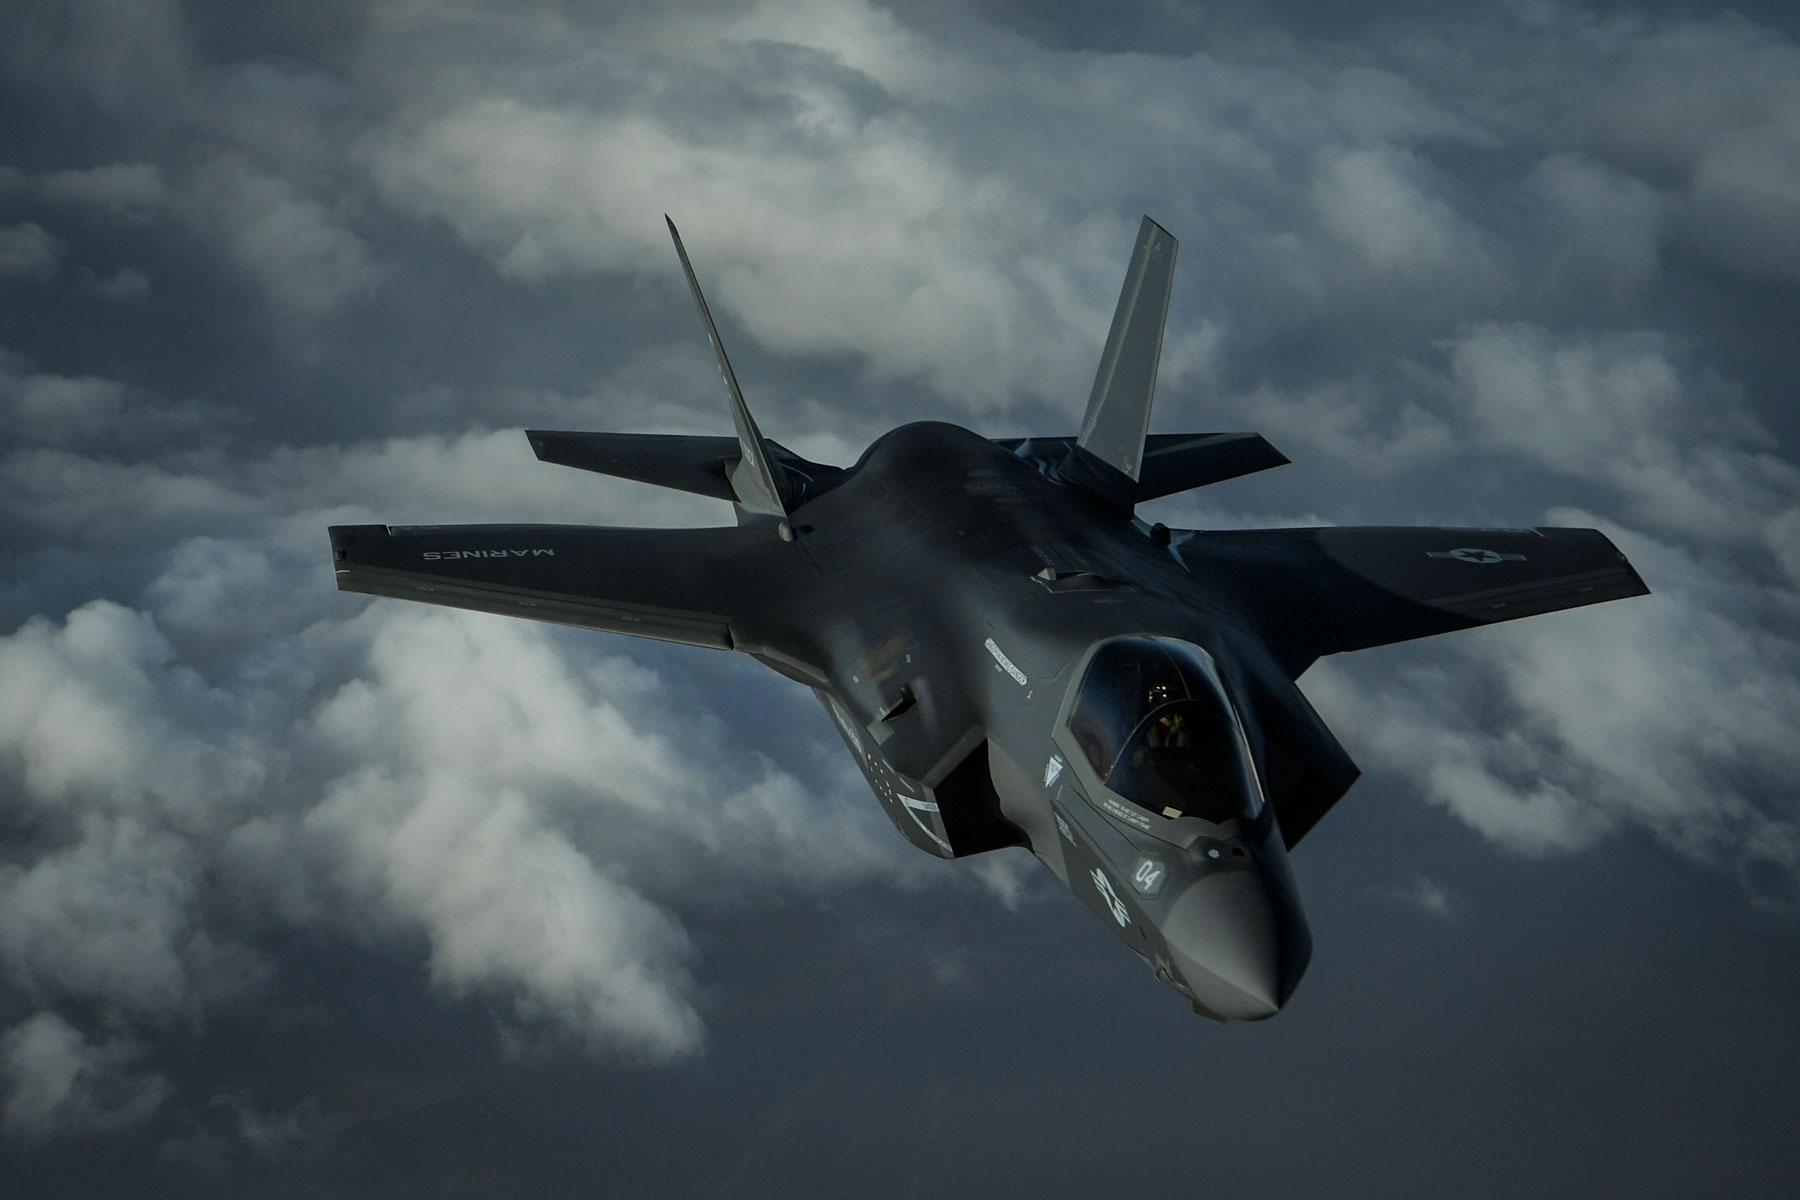 Pentagon Suspends All F-35 Operations After South Carolina Crash